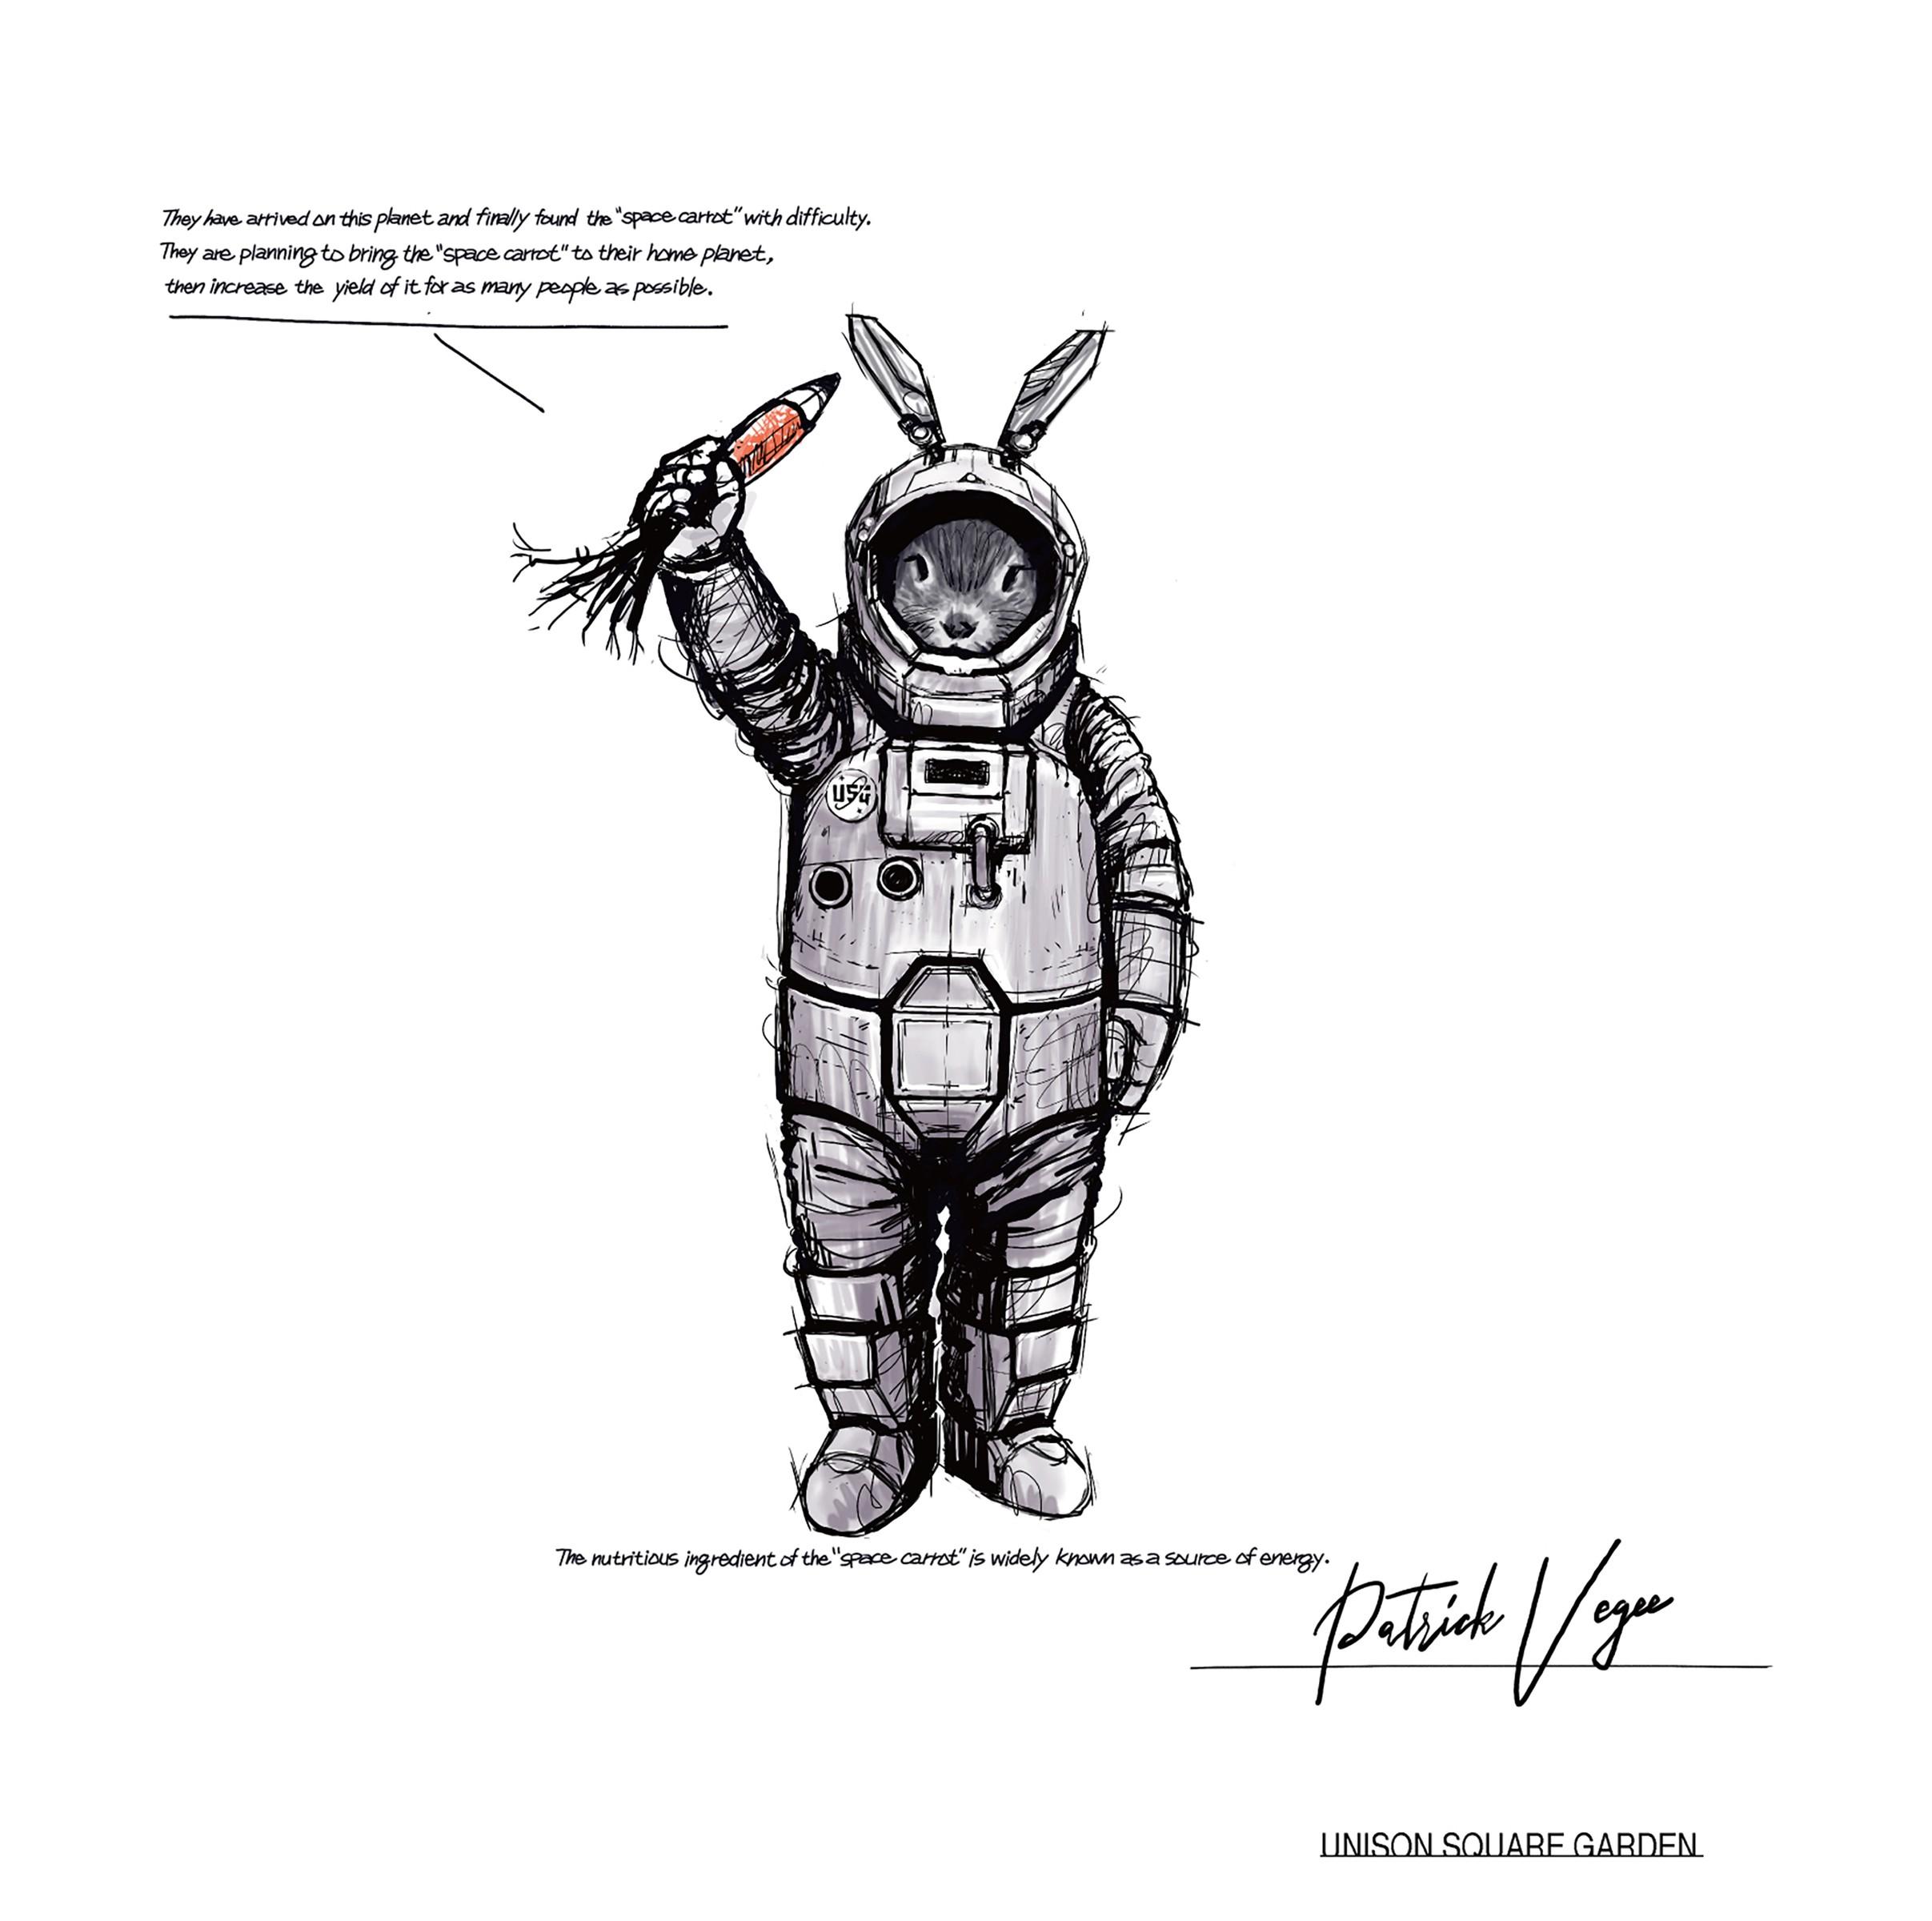 [Album] UNISON SQUARE GARDEN – Patrick Vegee [FLAC / WEB] [2020.09.30]